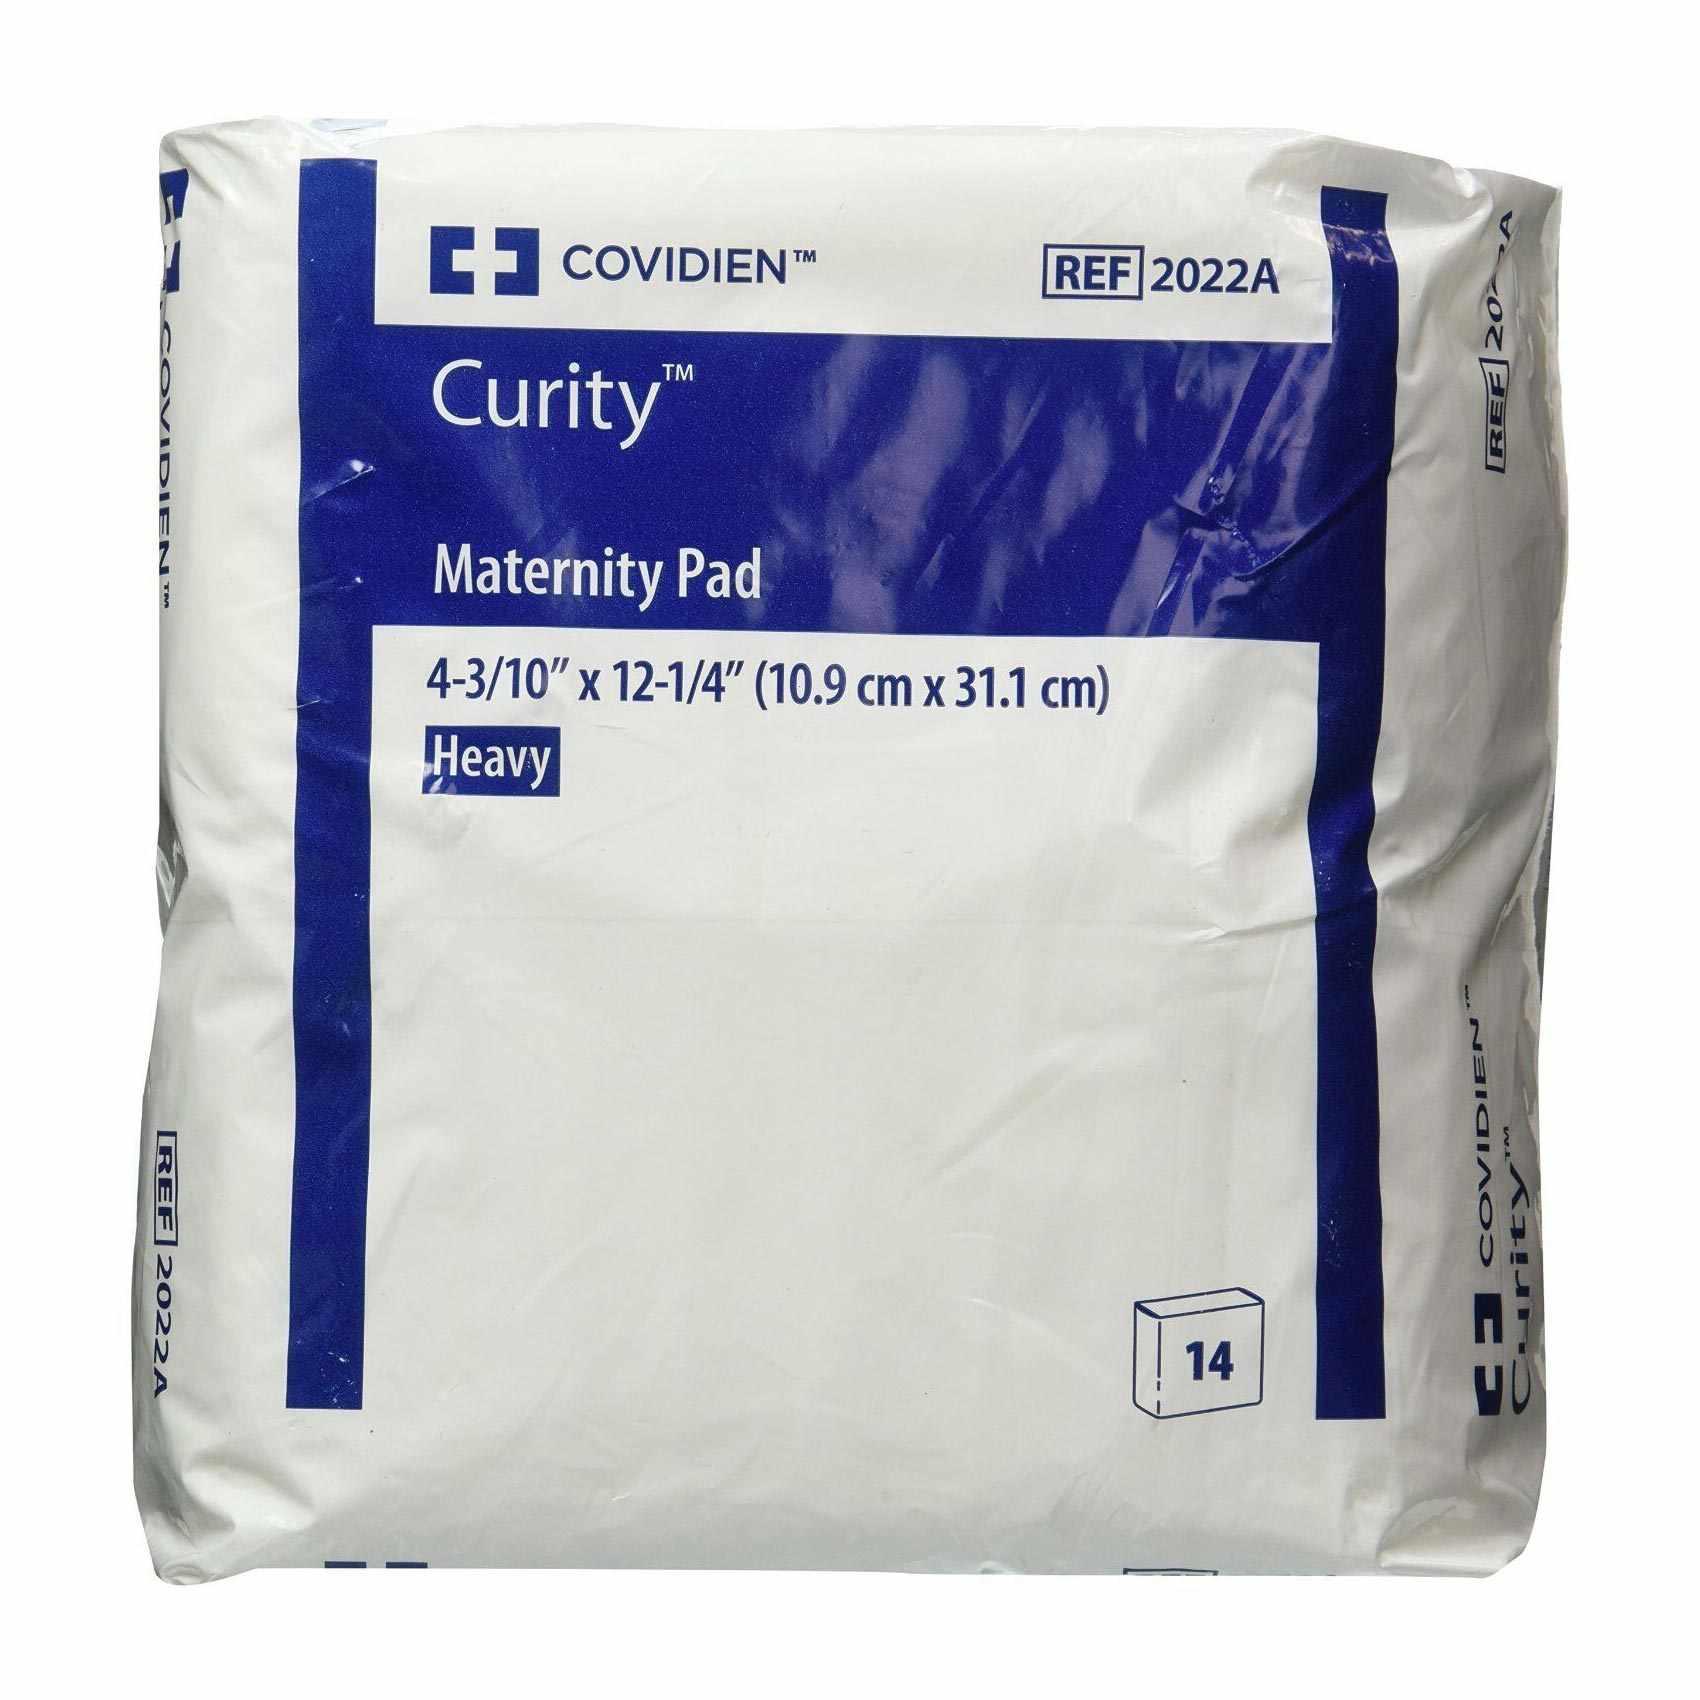 Curity Heavy Maternity Pad, 12-1/4 Inch Length